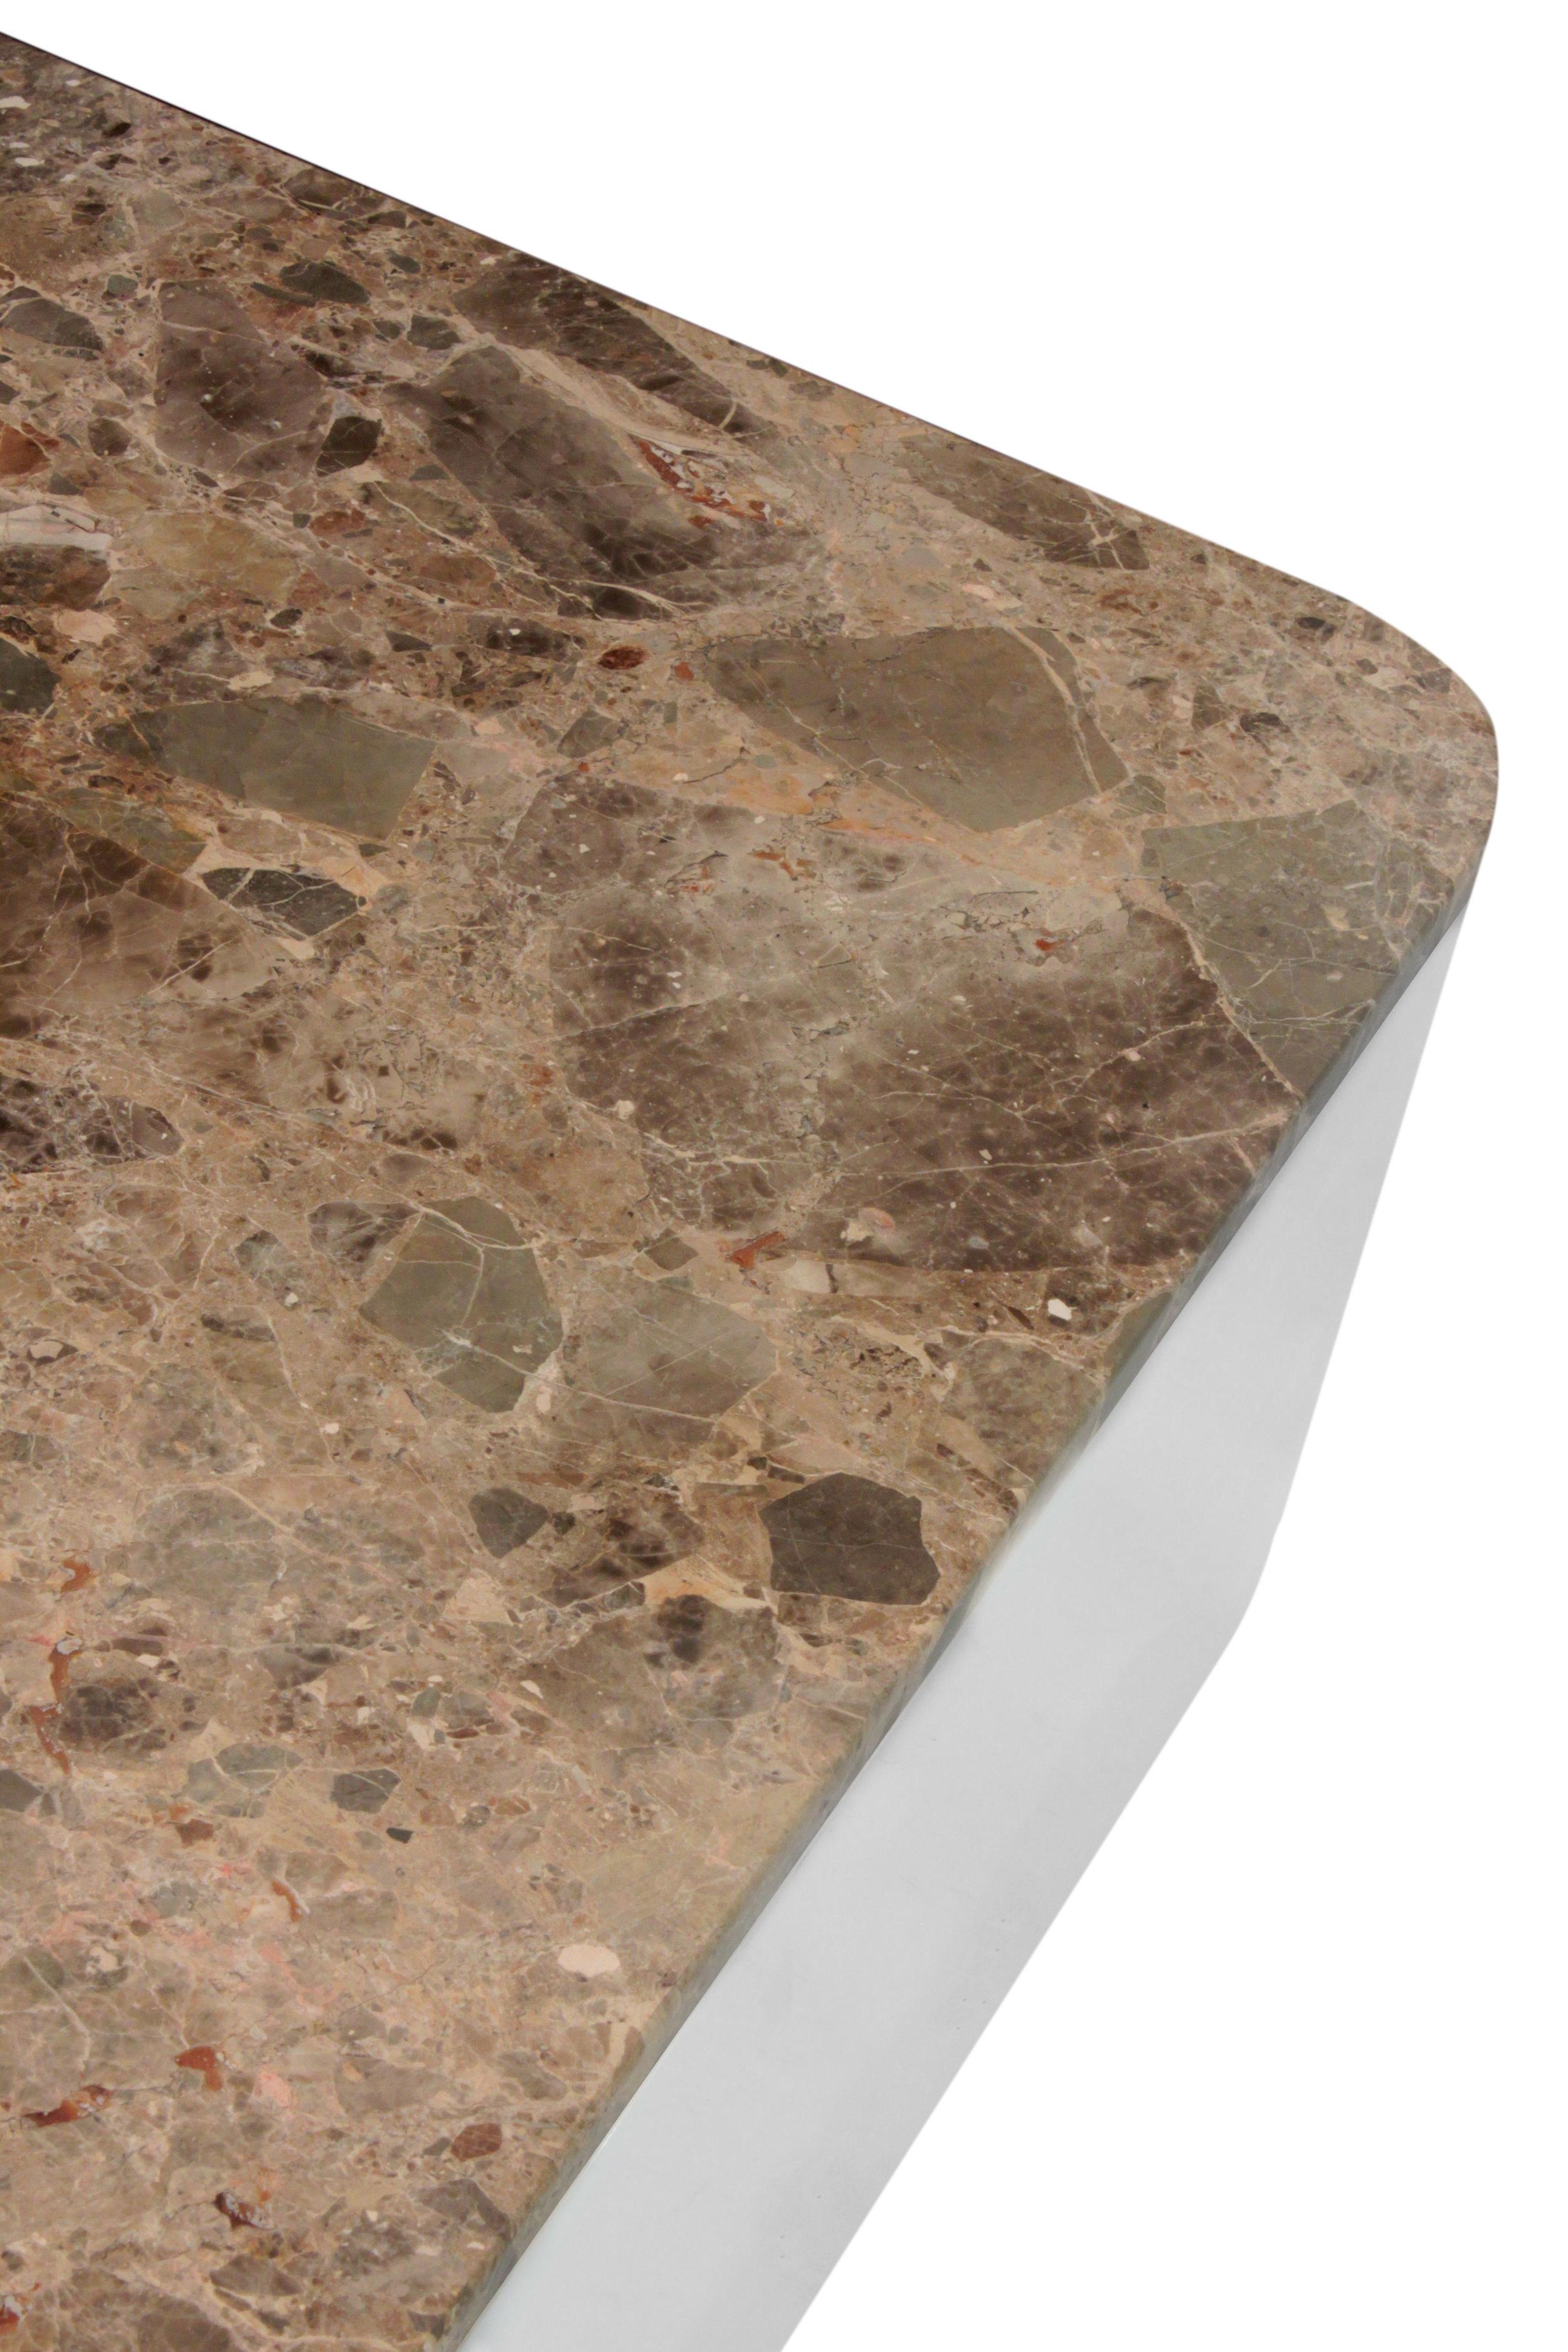 Brueton 85 polished steel+marble coffeetable75 detail3 hires.jpg